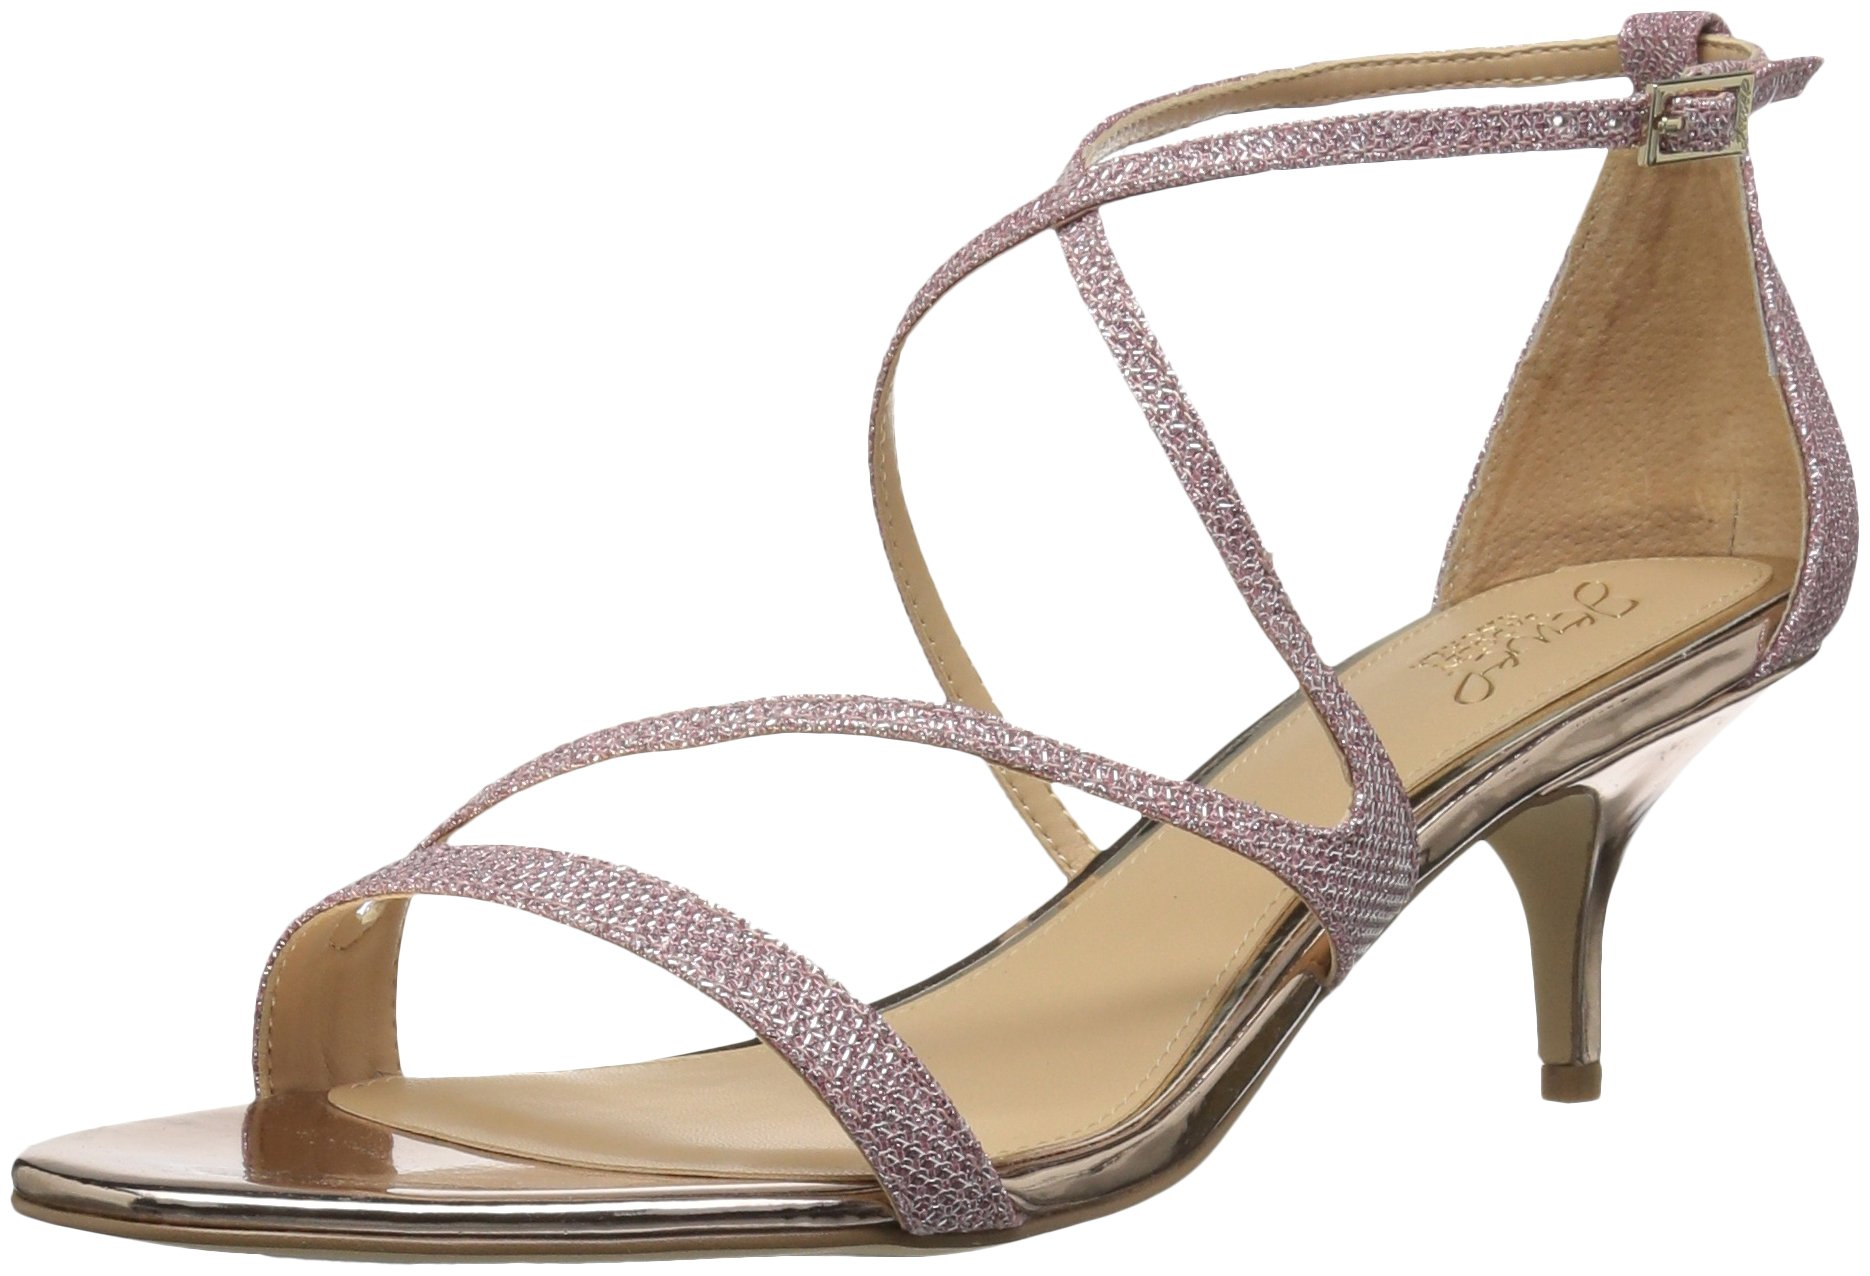 Badgley Mischka Jewel Women's Gal Heeled Sandal, Rose Gold, 6 Medium US by Badgley Mischka